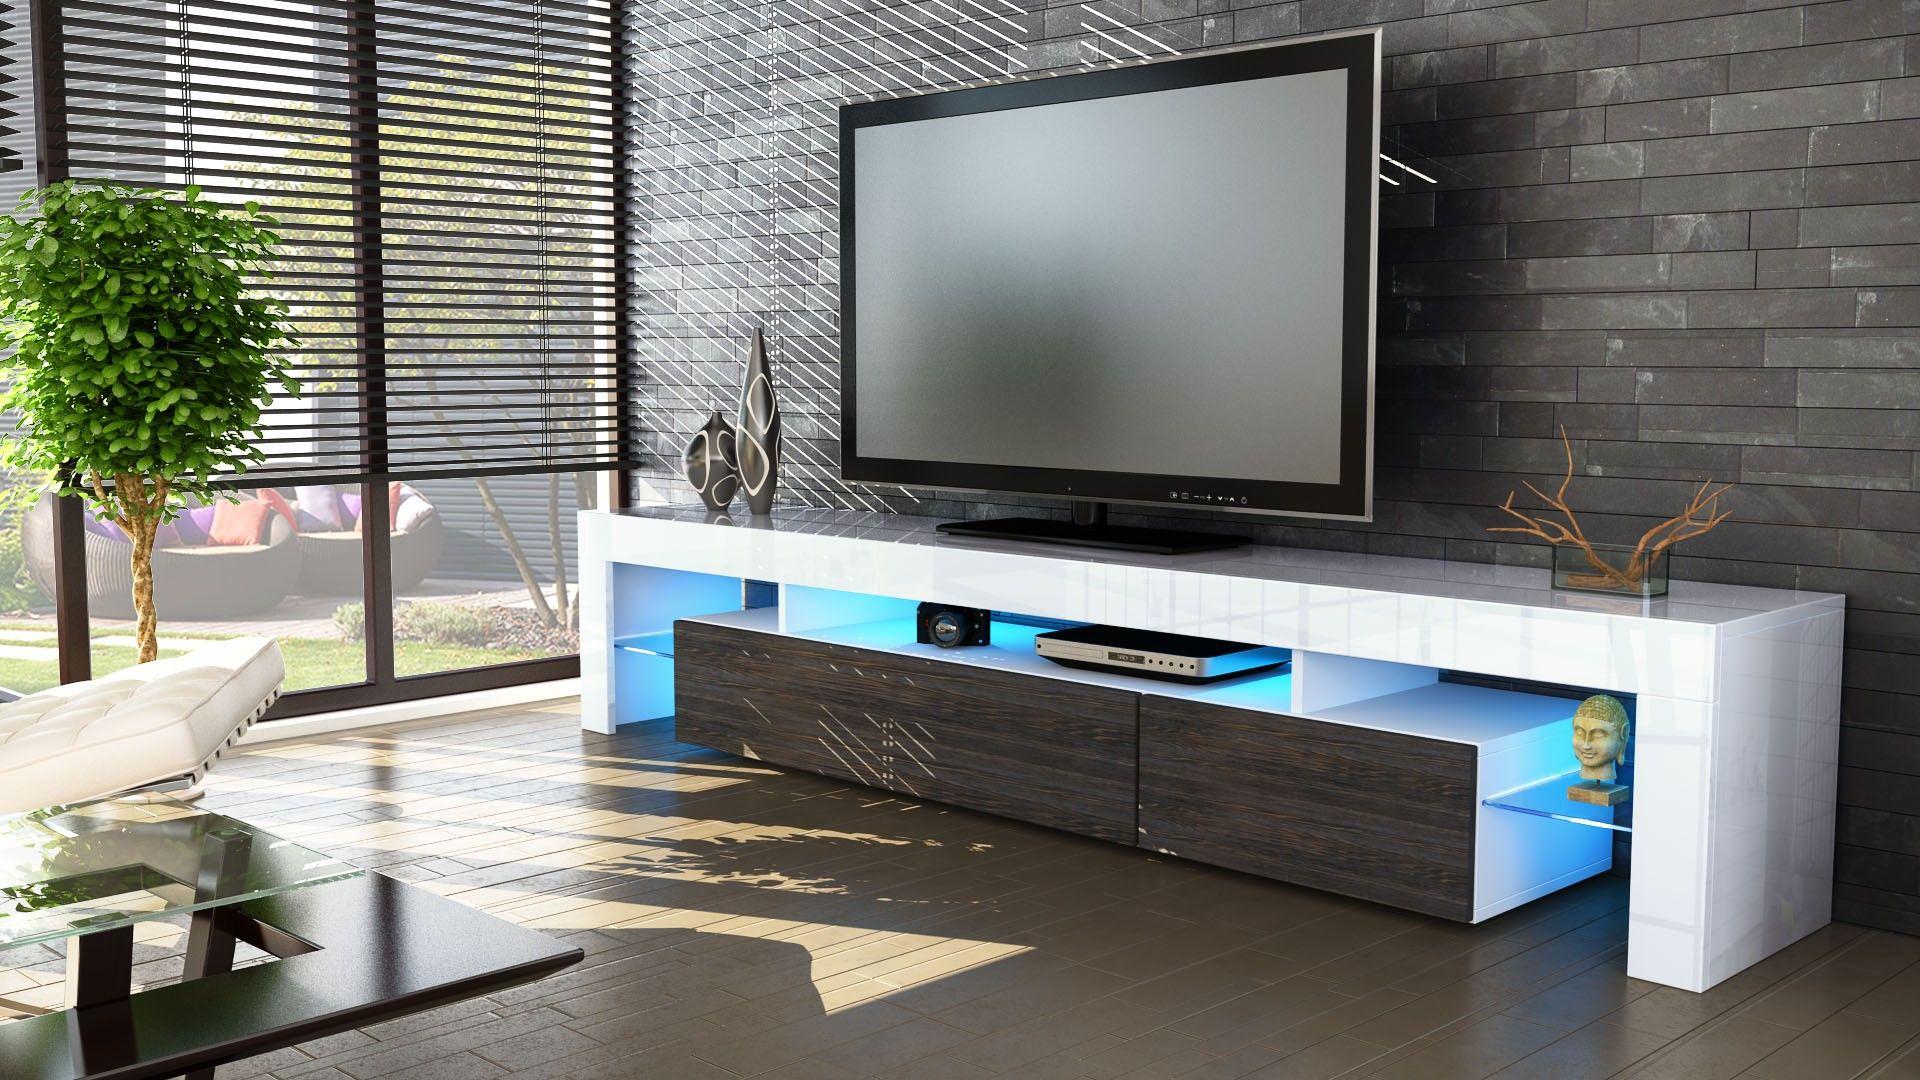 meuble tv blanc et bois wengé 199 cm | meuble tv | pinterest | tvs - Meuble Tv Design Wenge